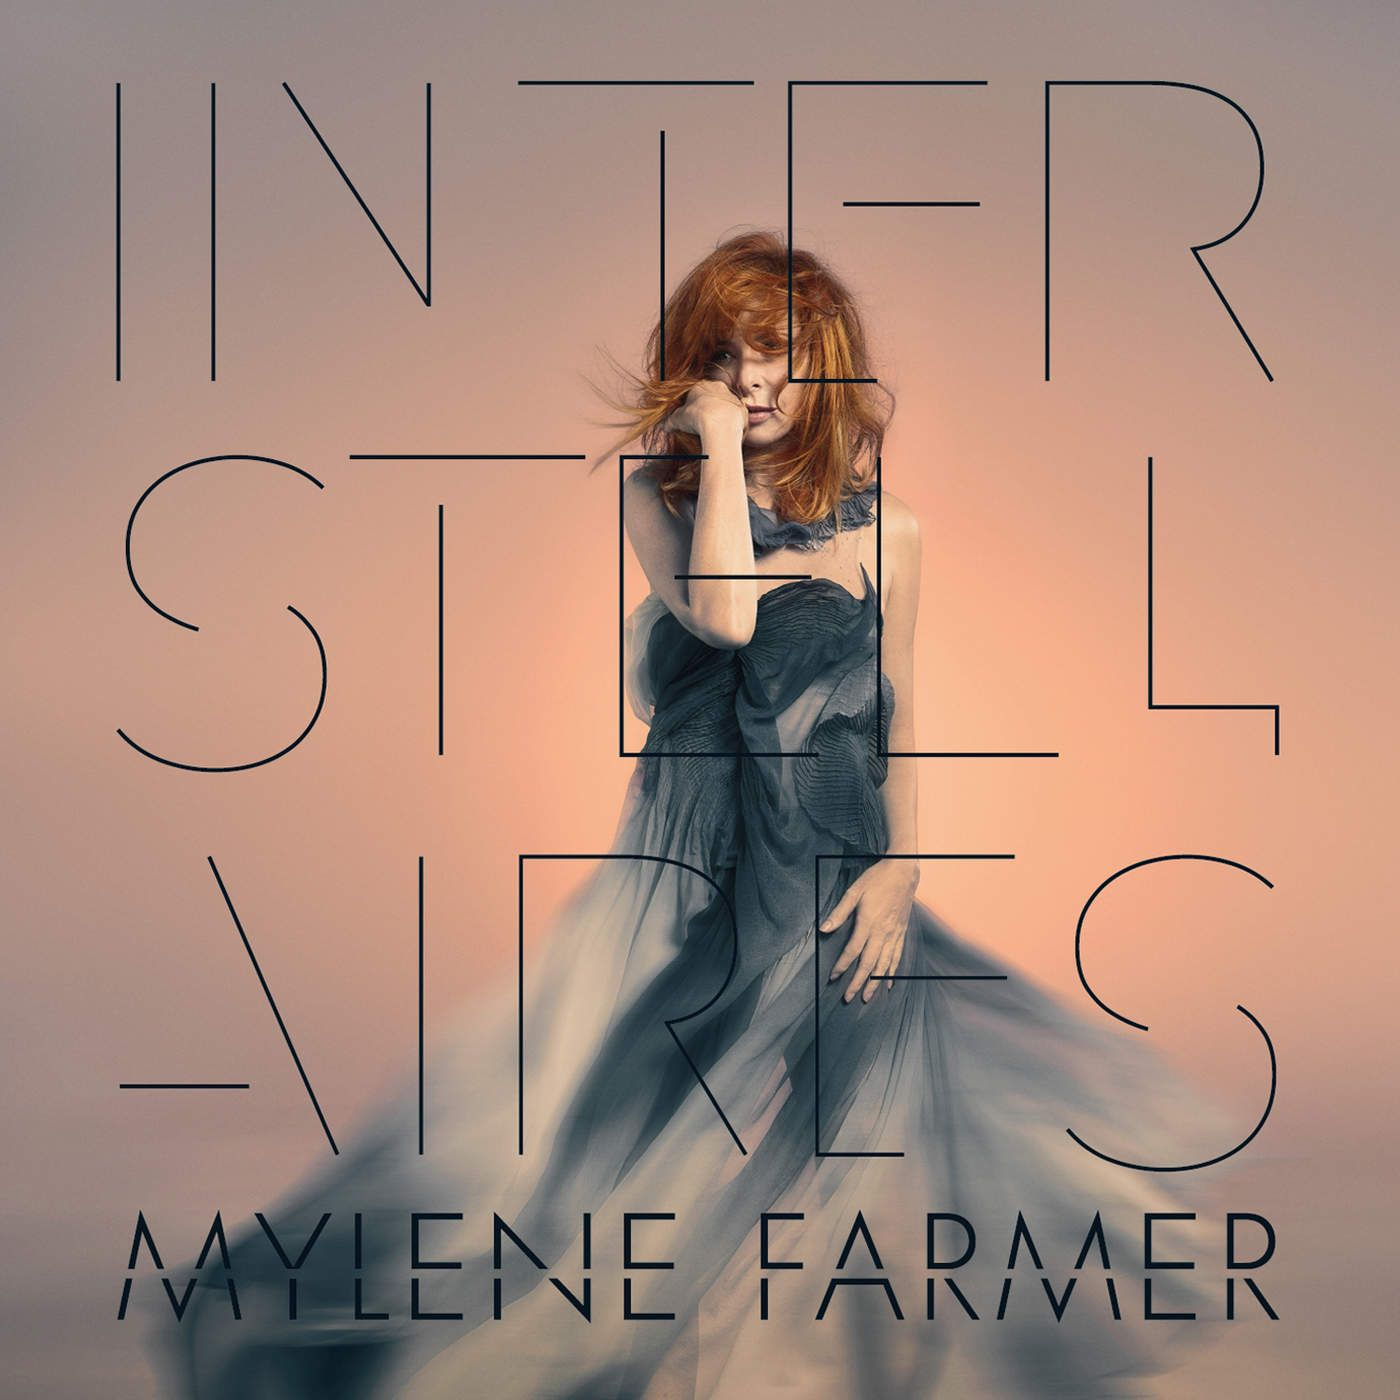 Mylène Farmer - Interstellaires album cover